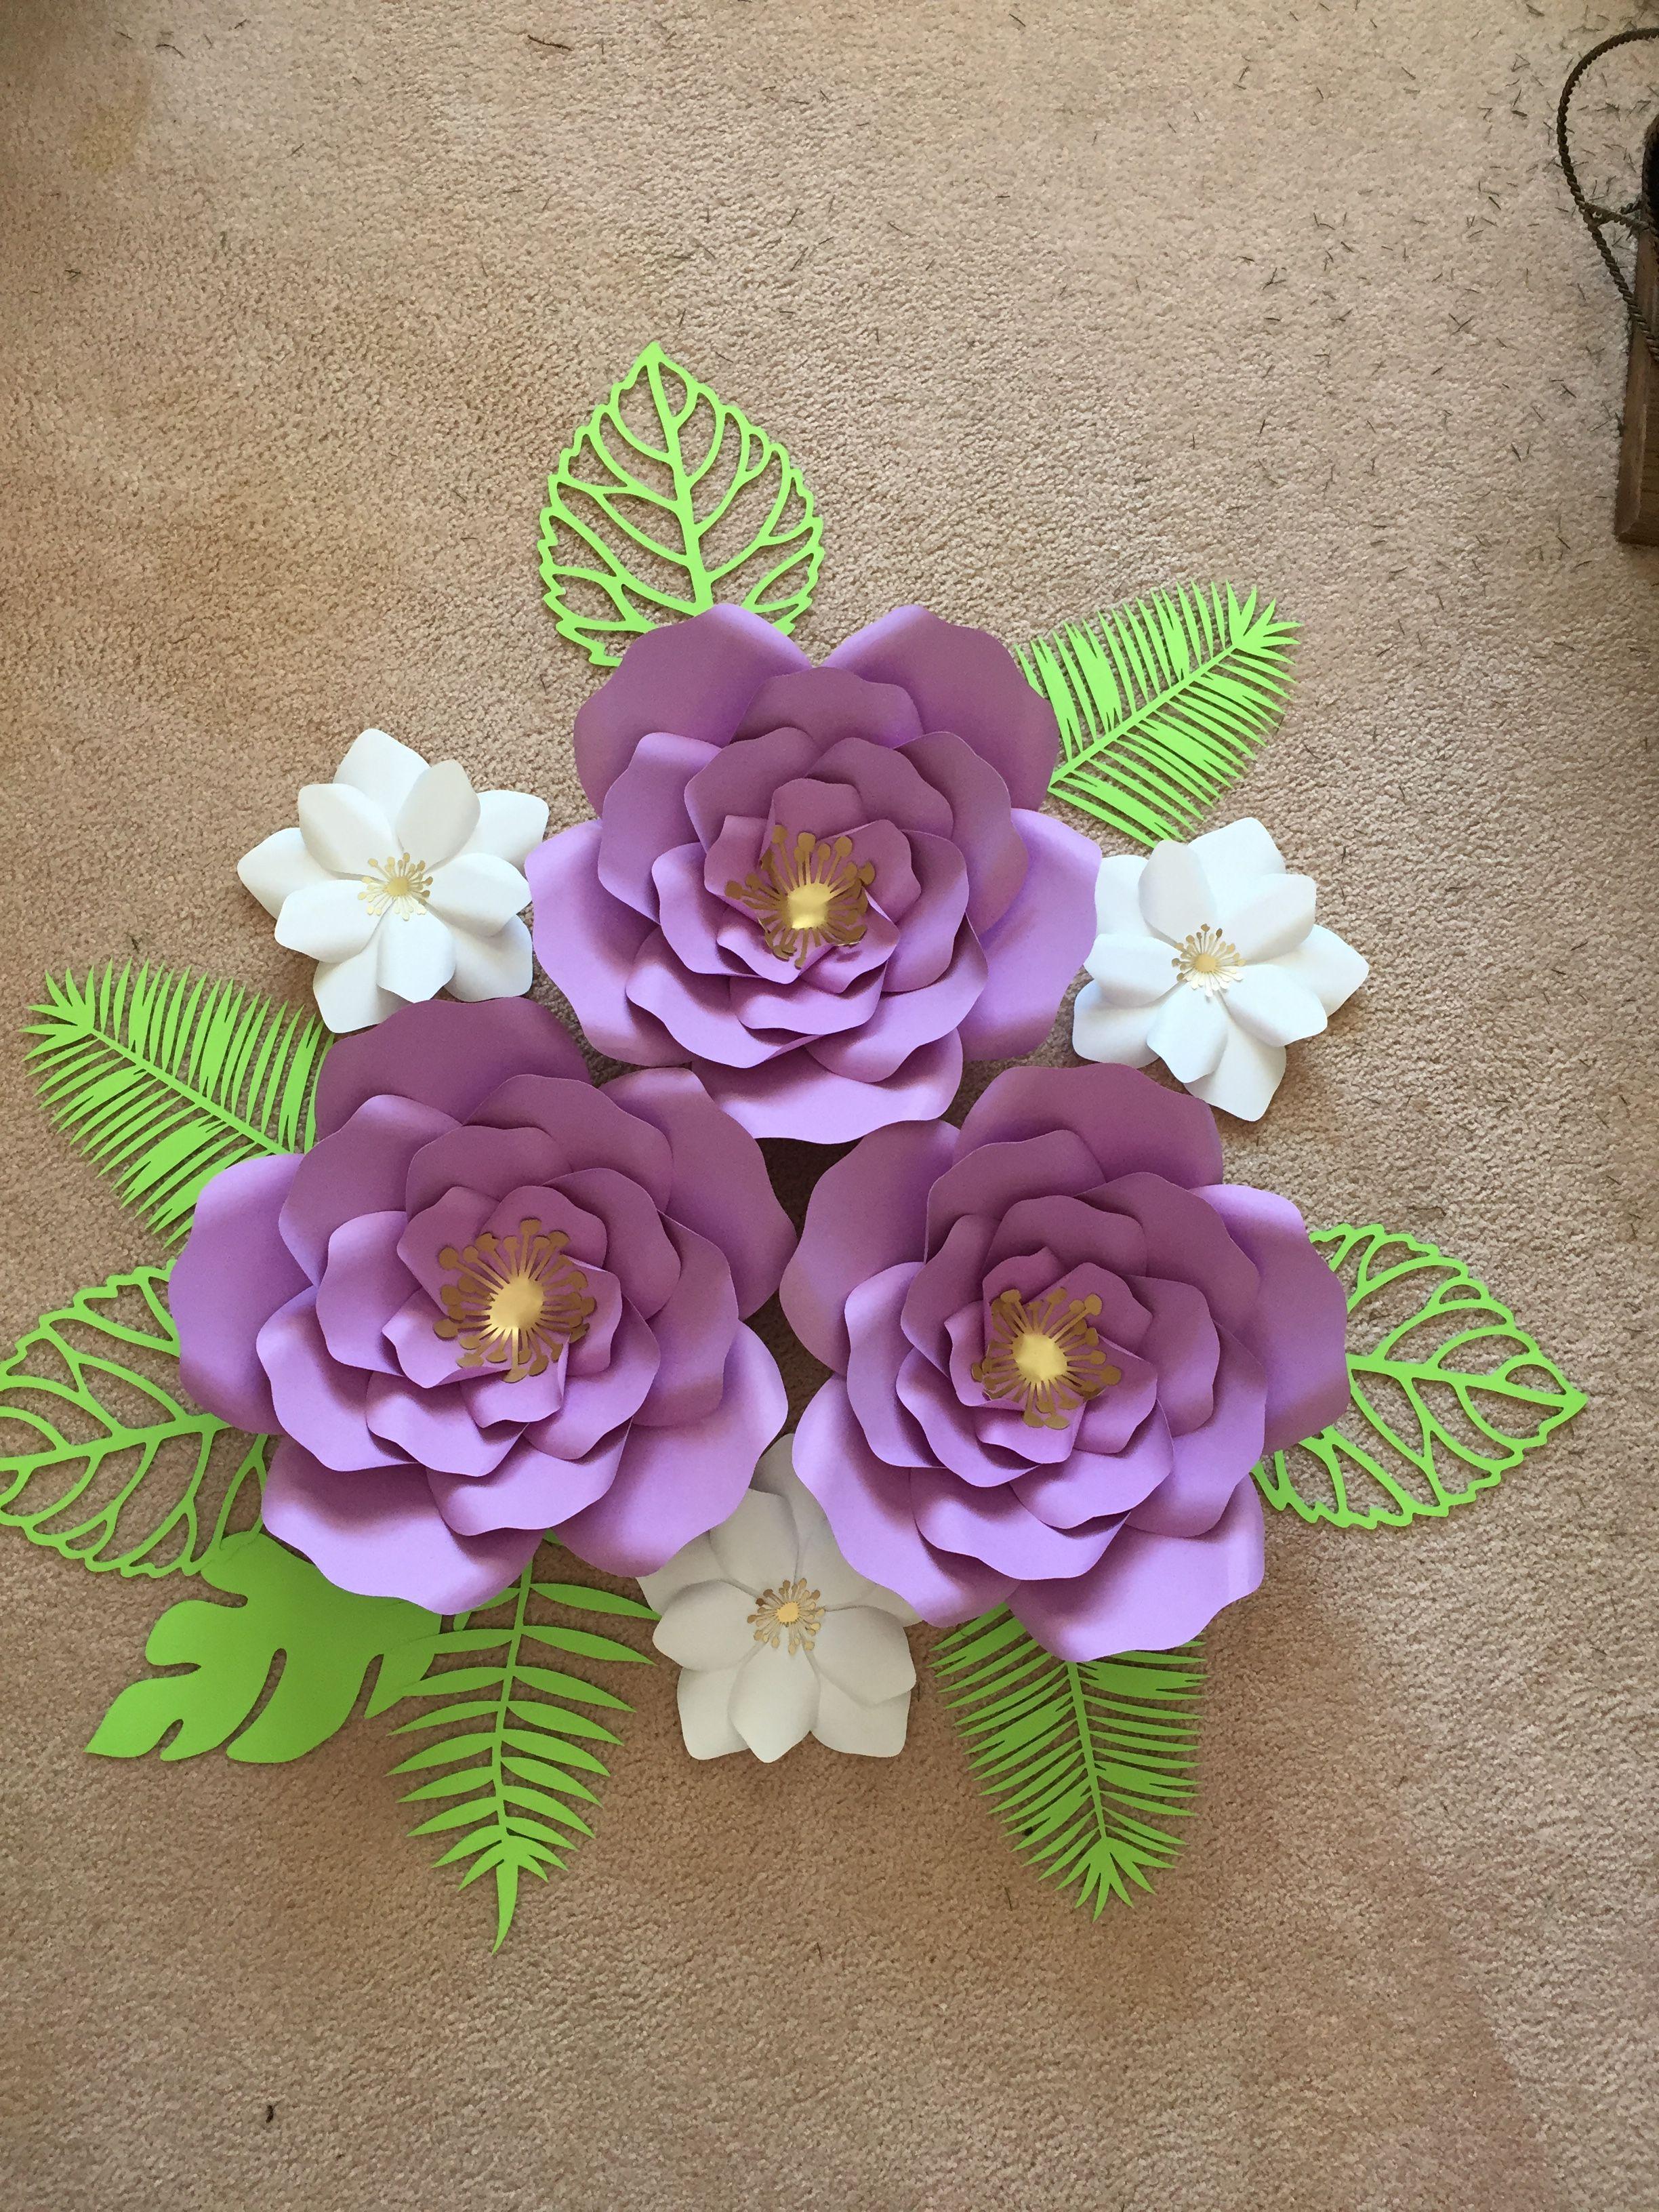 Tropical Paper Flowers Flower Templates Pinterest Paper Roses